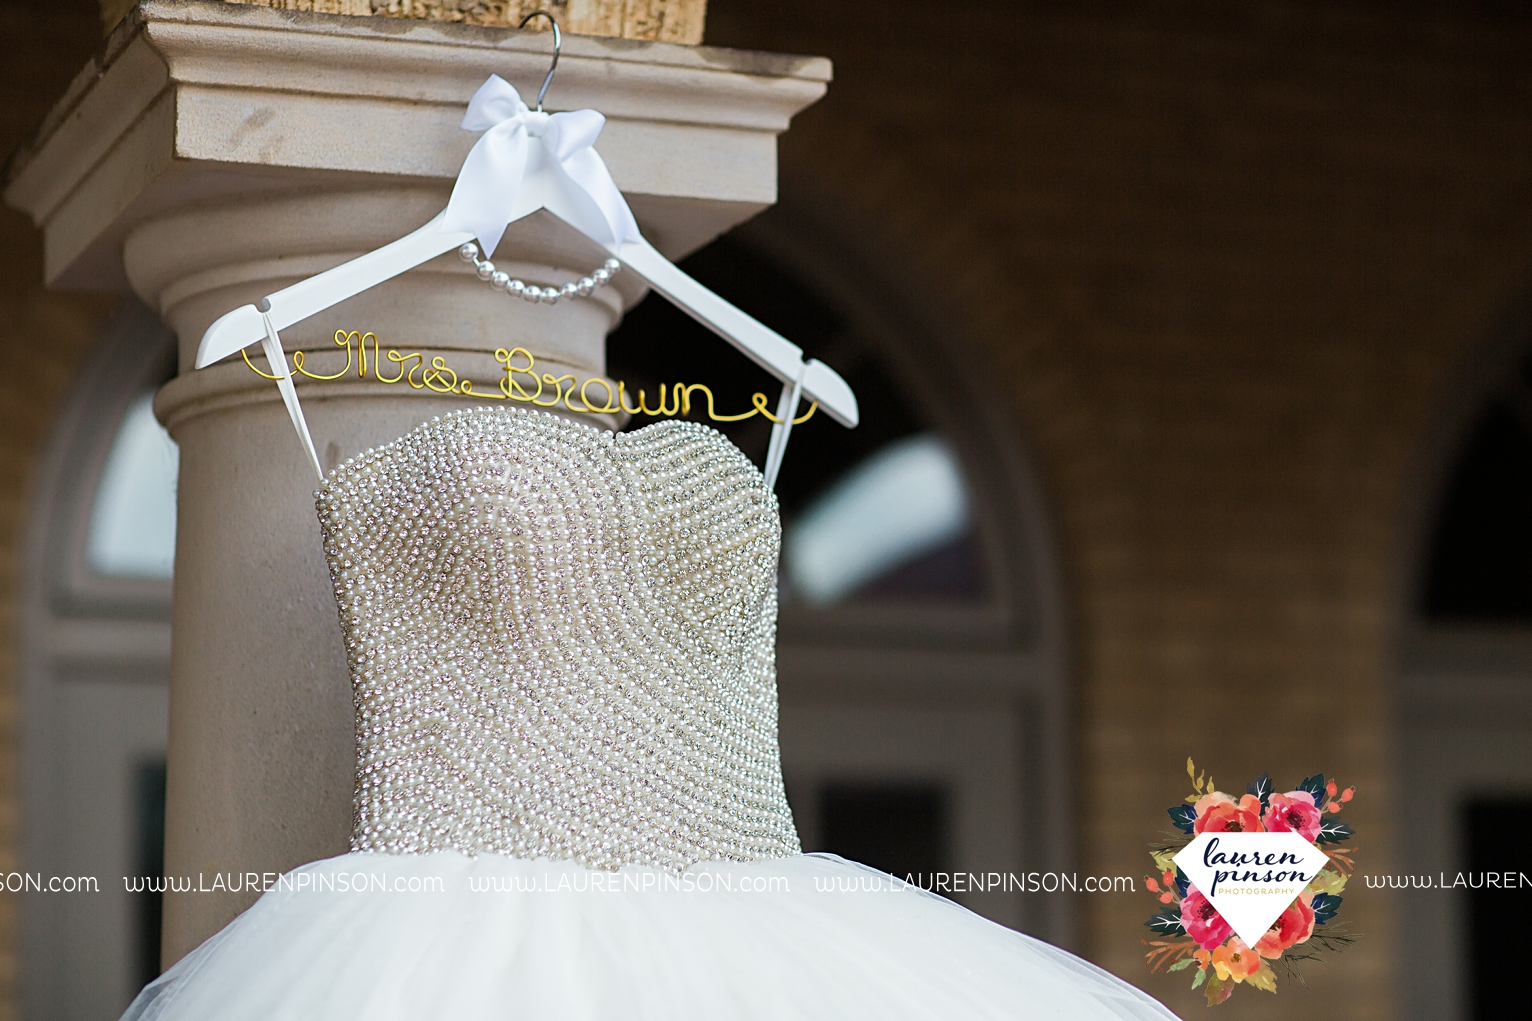 wichita-falls-texas-wedding-photographer-the-forum-by-the-kemp-mayfield-events-ulta-gold-glitter_2808.jpg